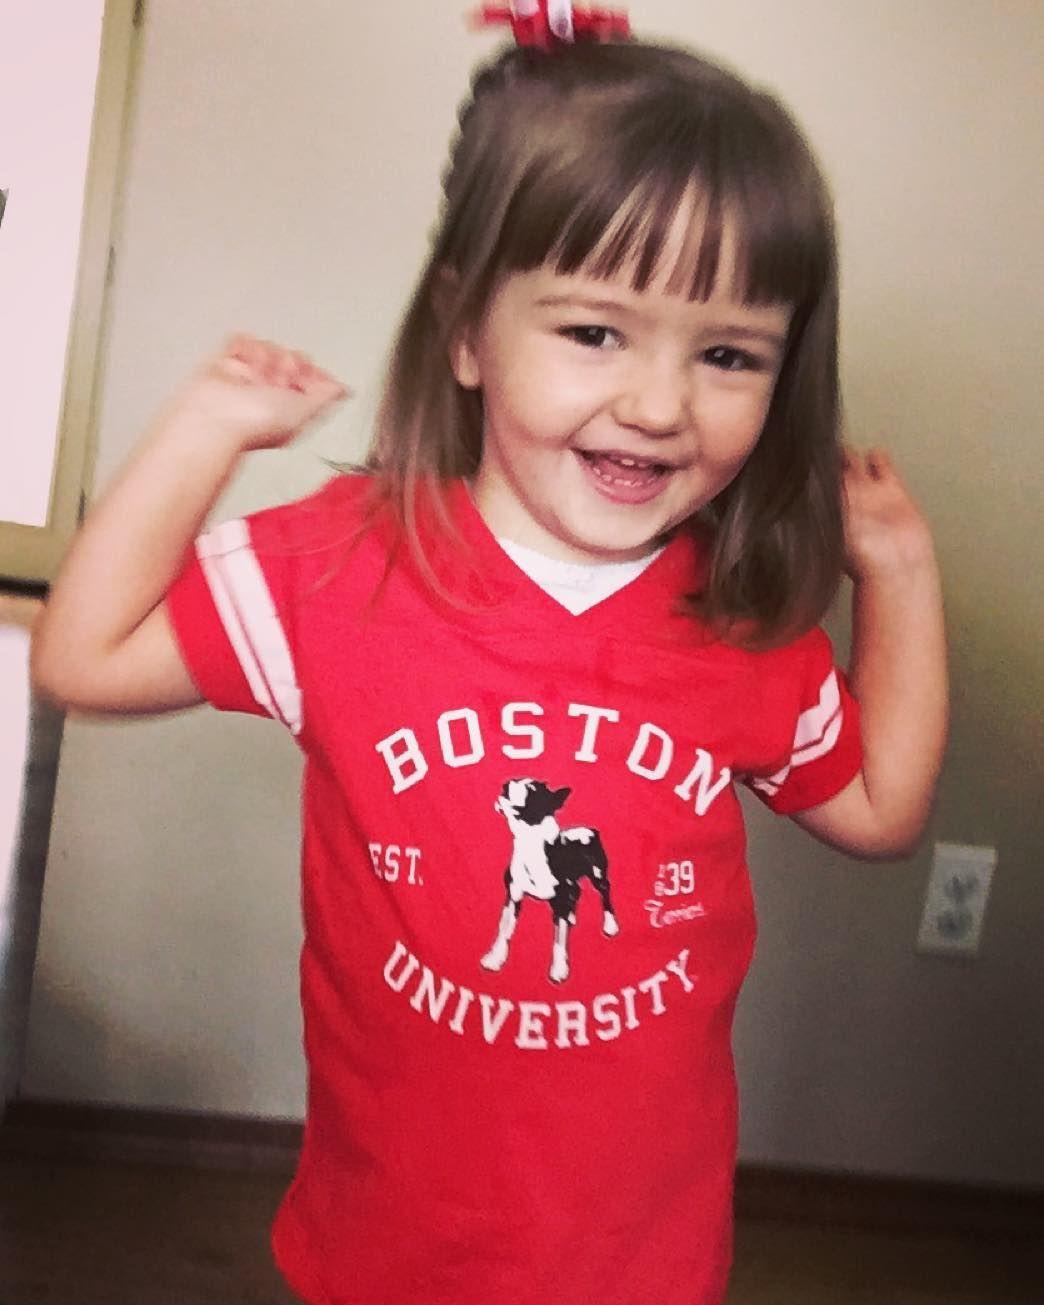 Eleanor is showing her school spirit! @katie_edson #bu2019 #bostonuniversity #bostonterrier #boston by nomiddlechild